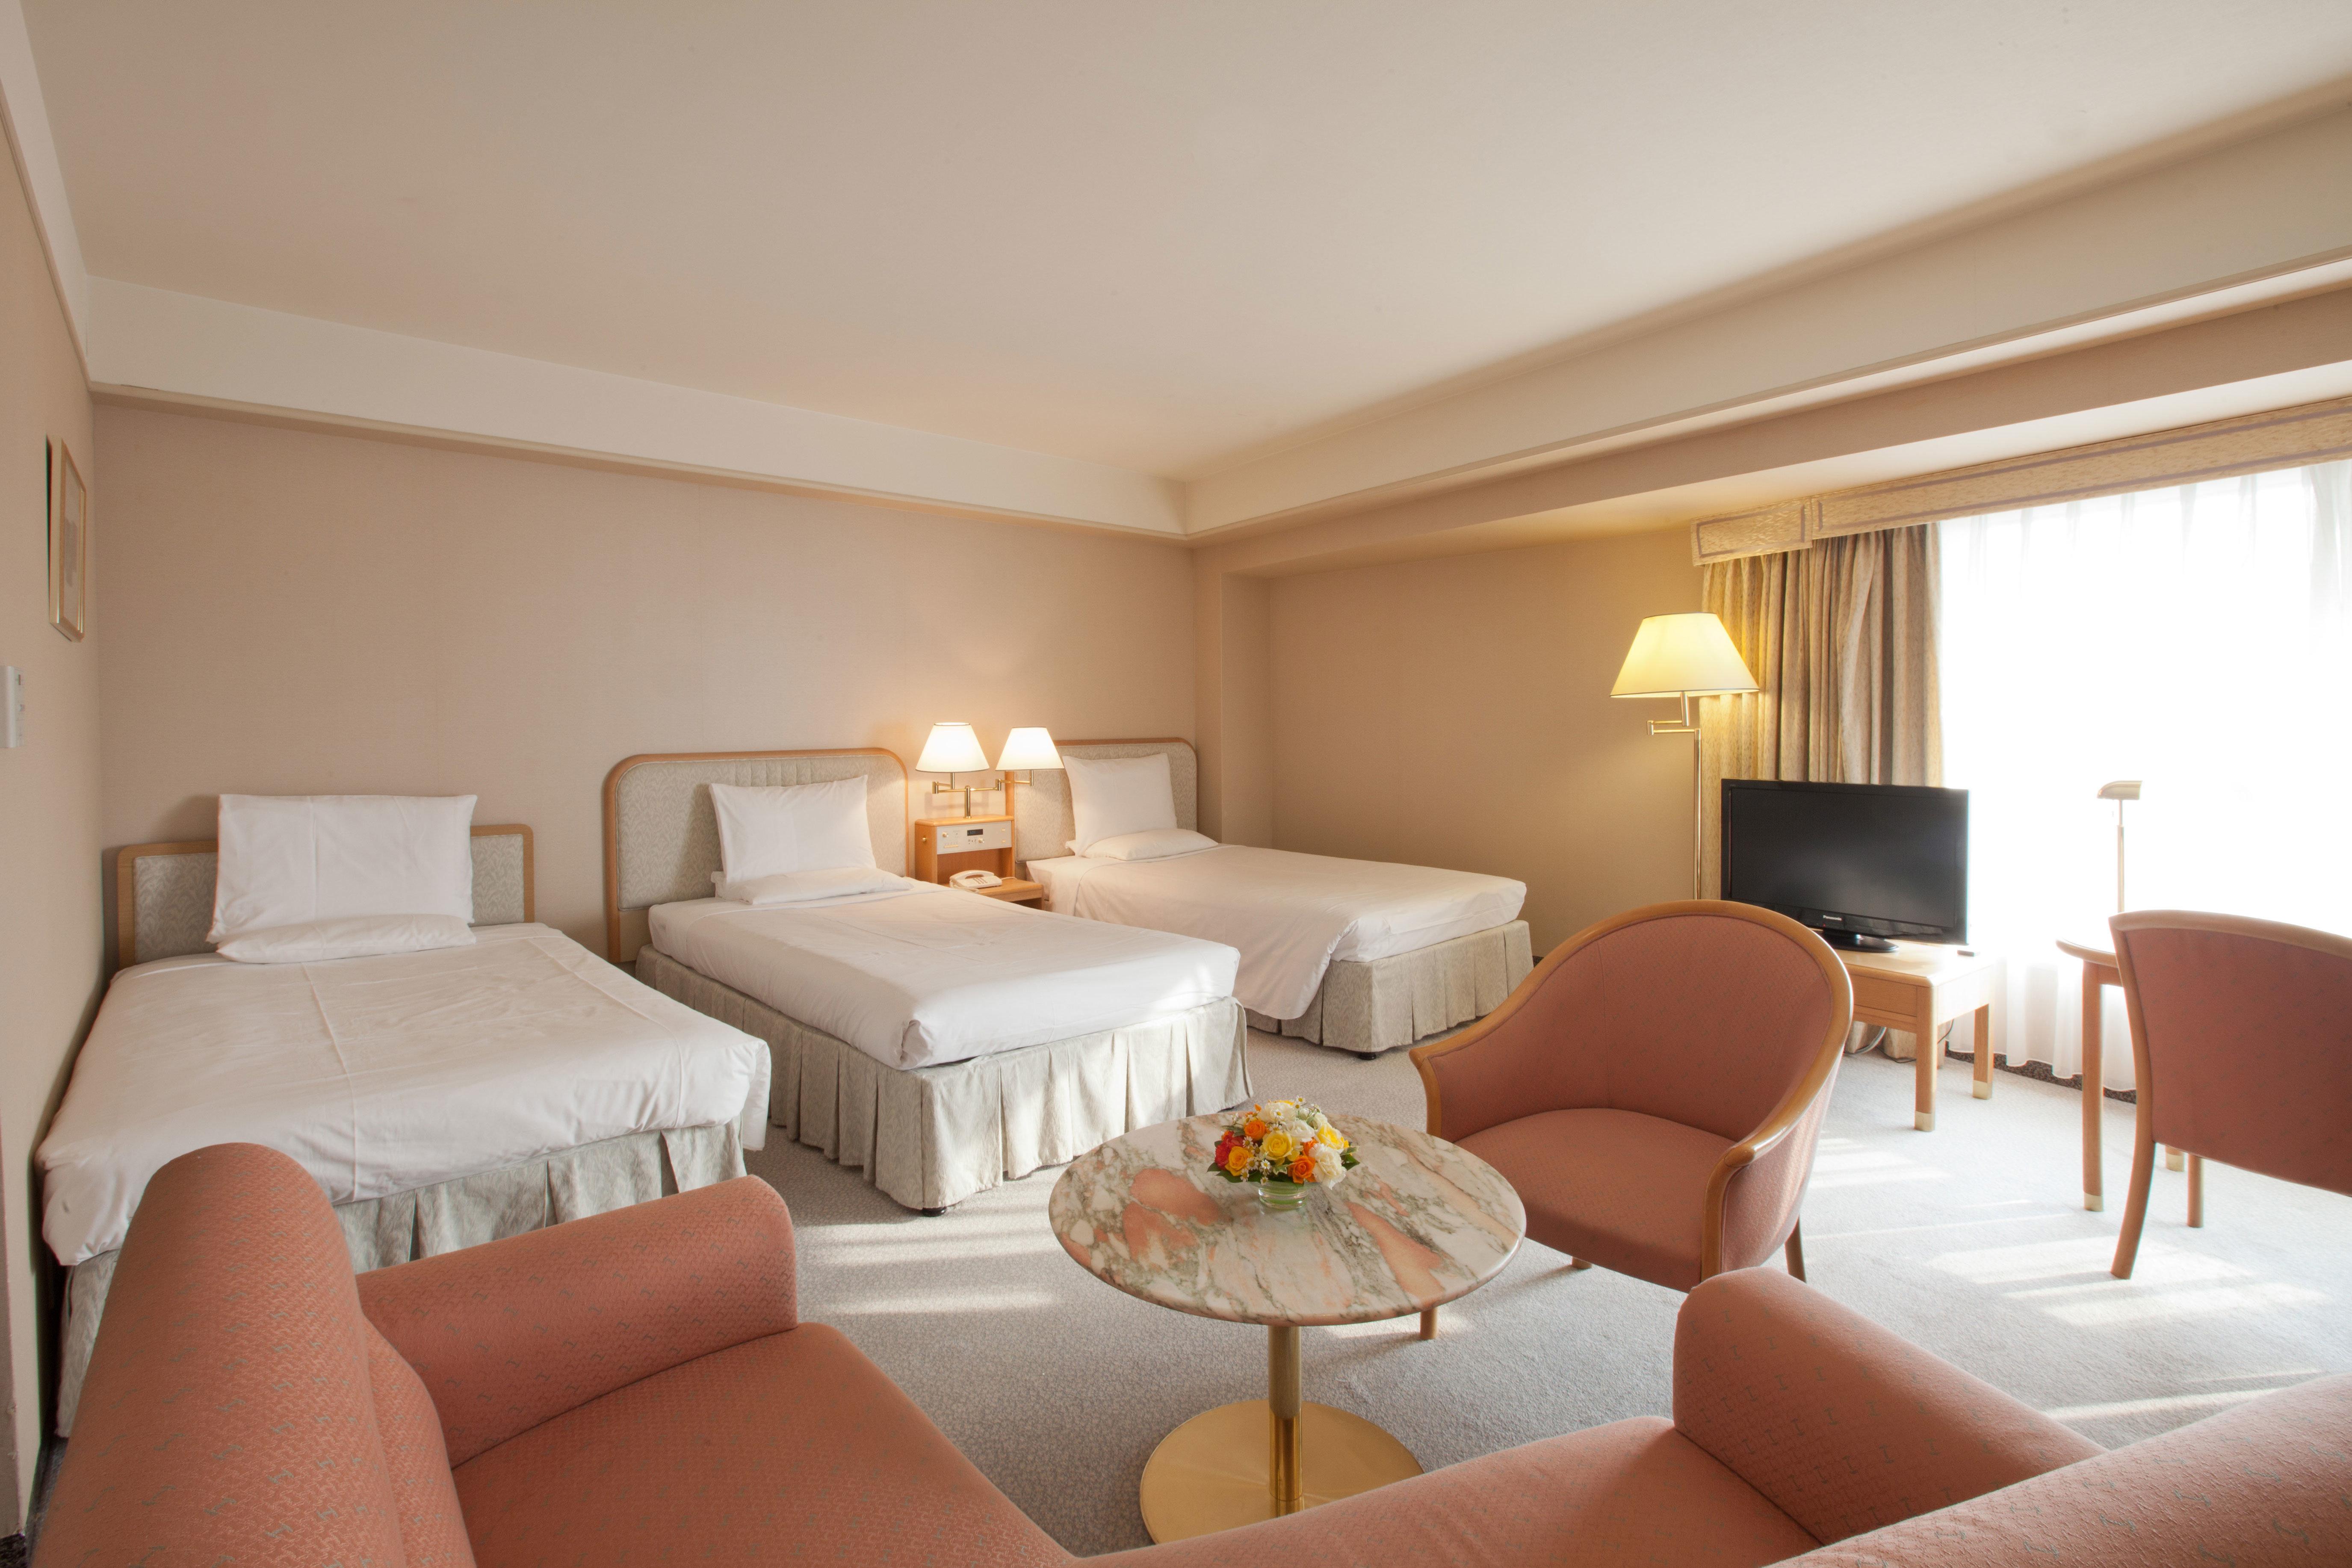 Bedroom City Classic Resort sofa property Suite cottage Villa